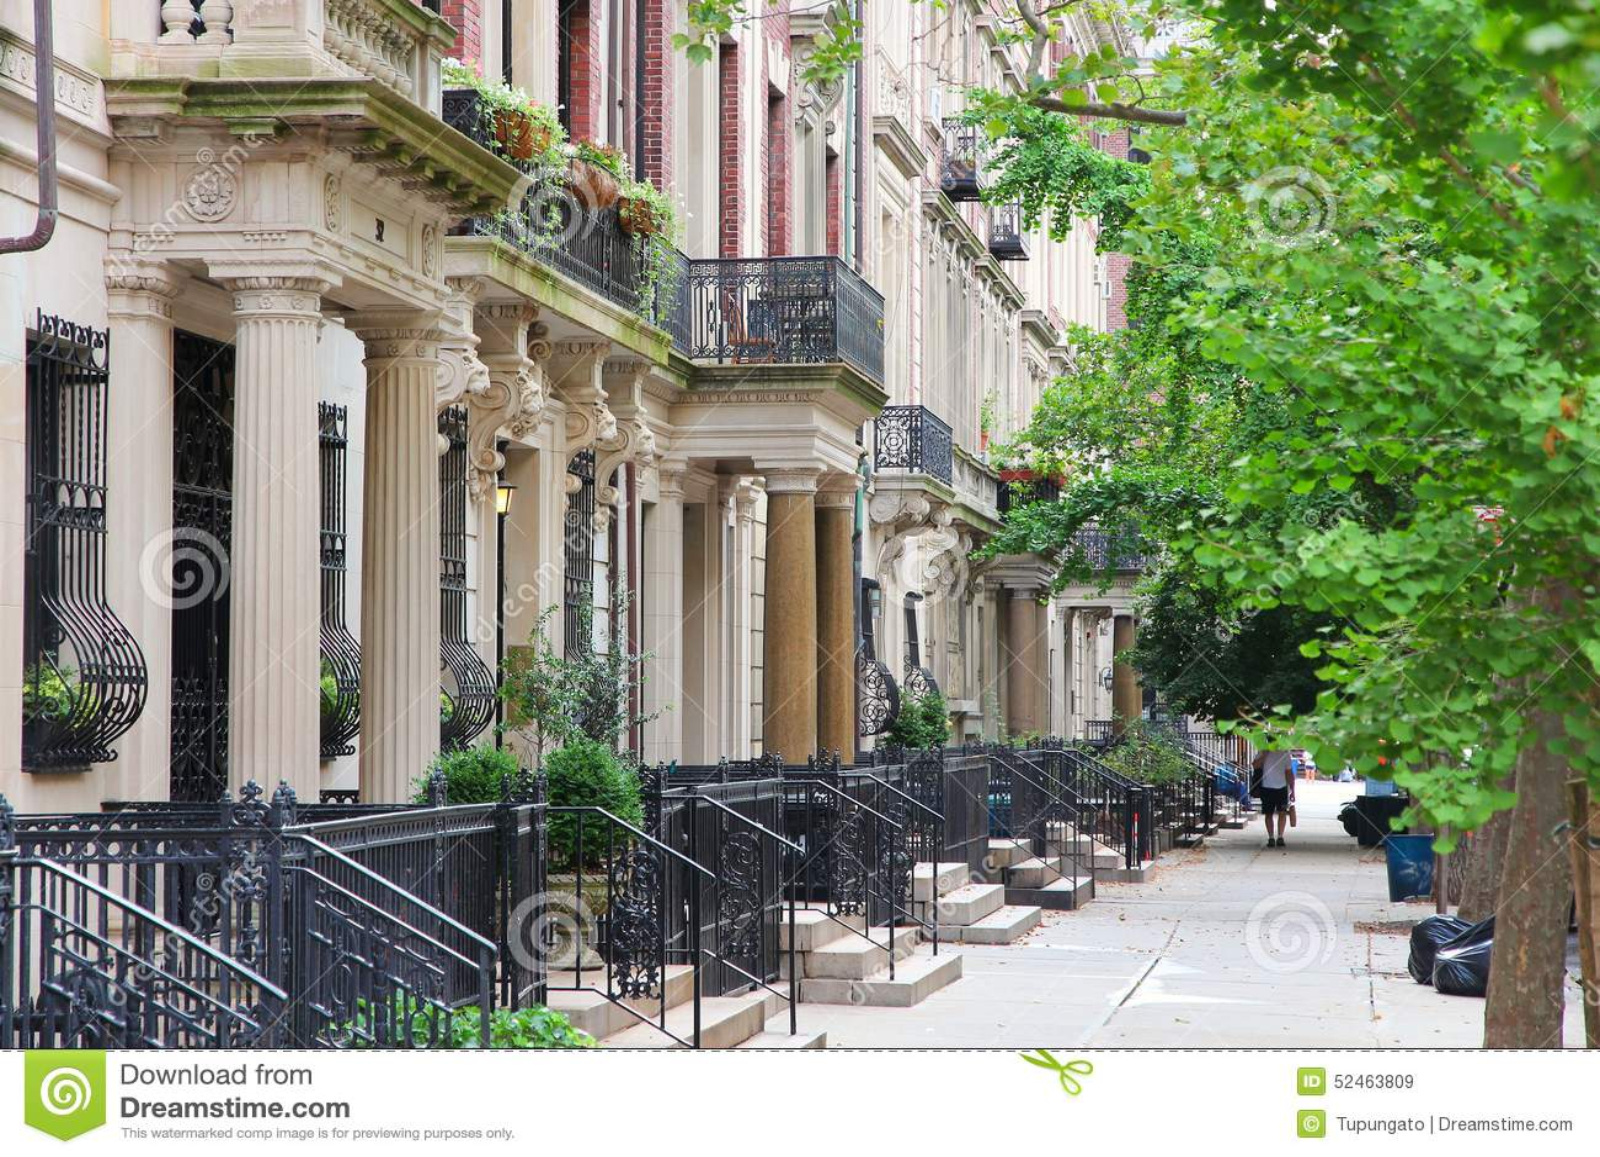 New York Brownstone Stock Photo Image 52463809